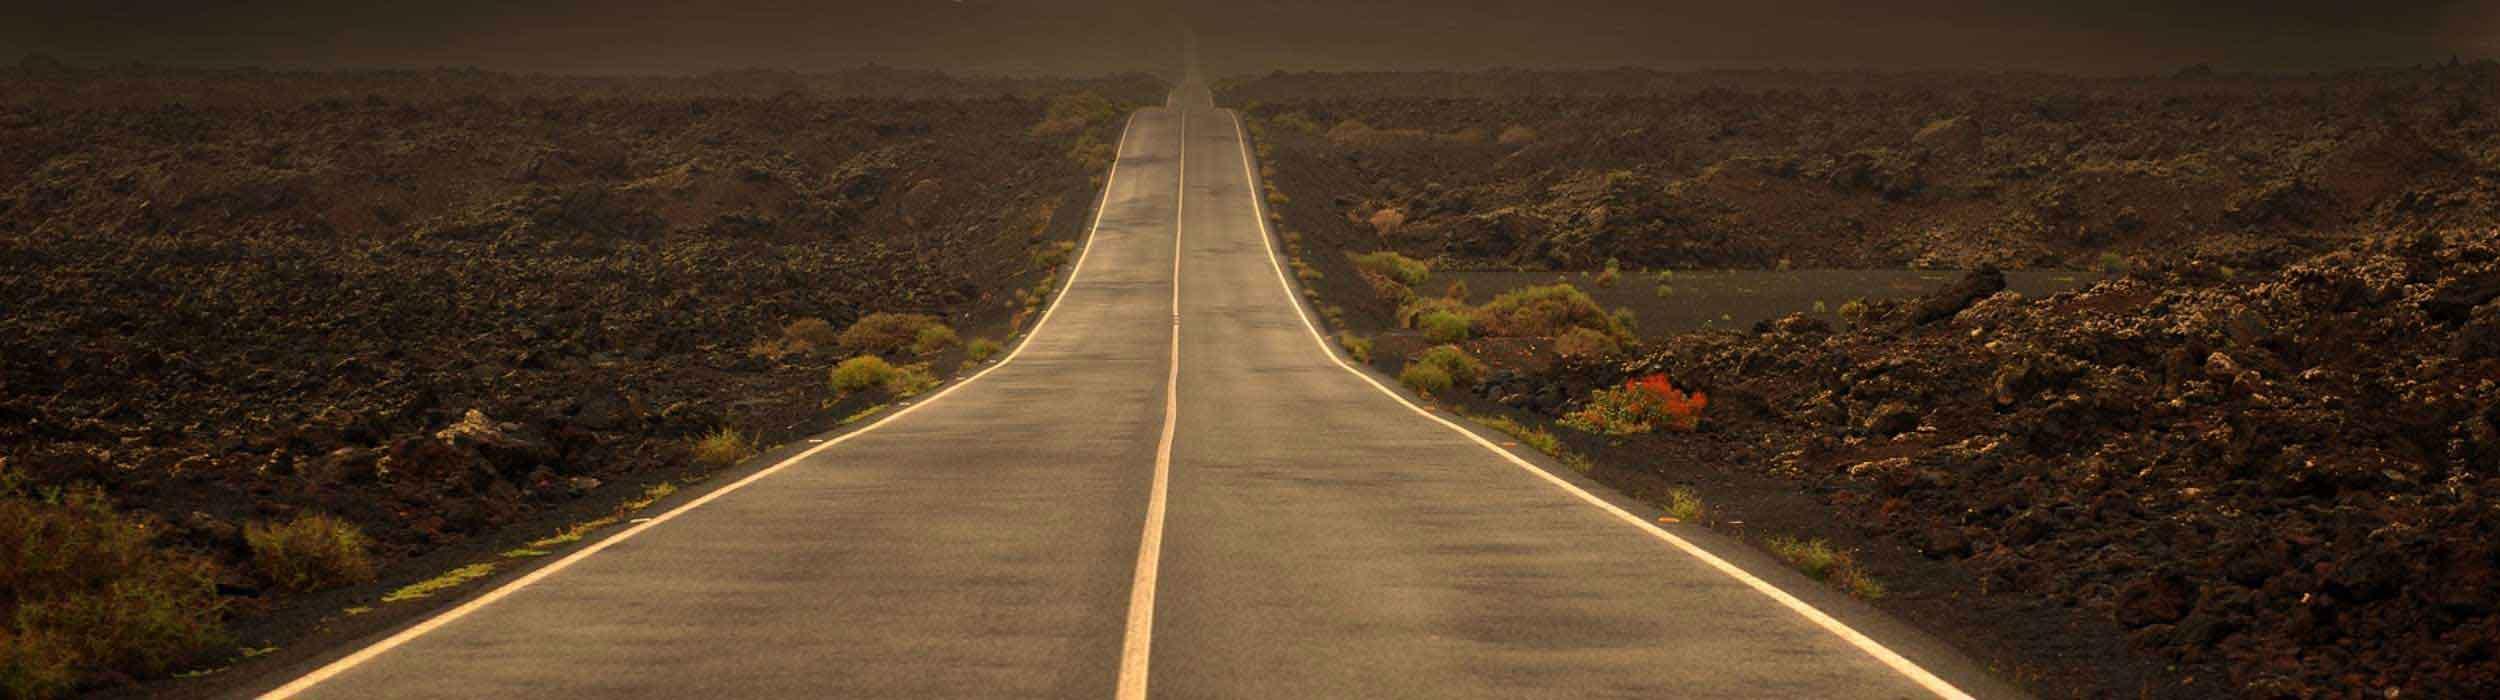 road-3186188_1920-2500x700_neu